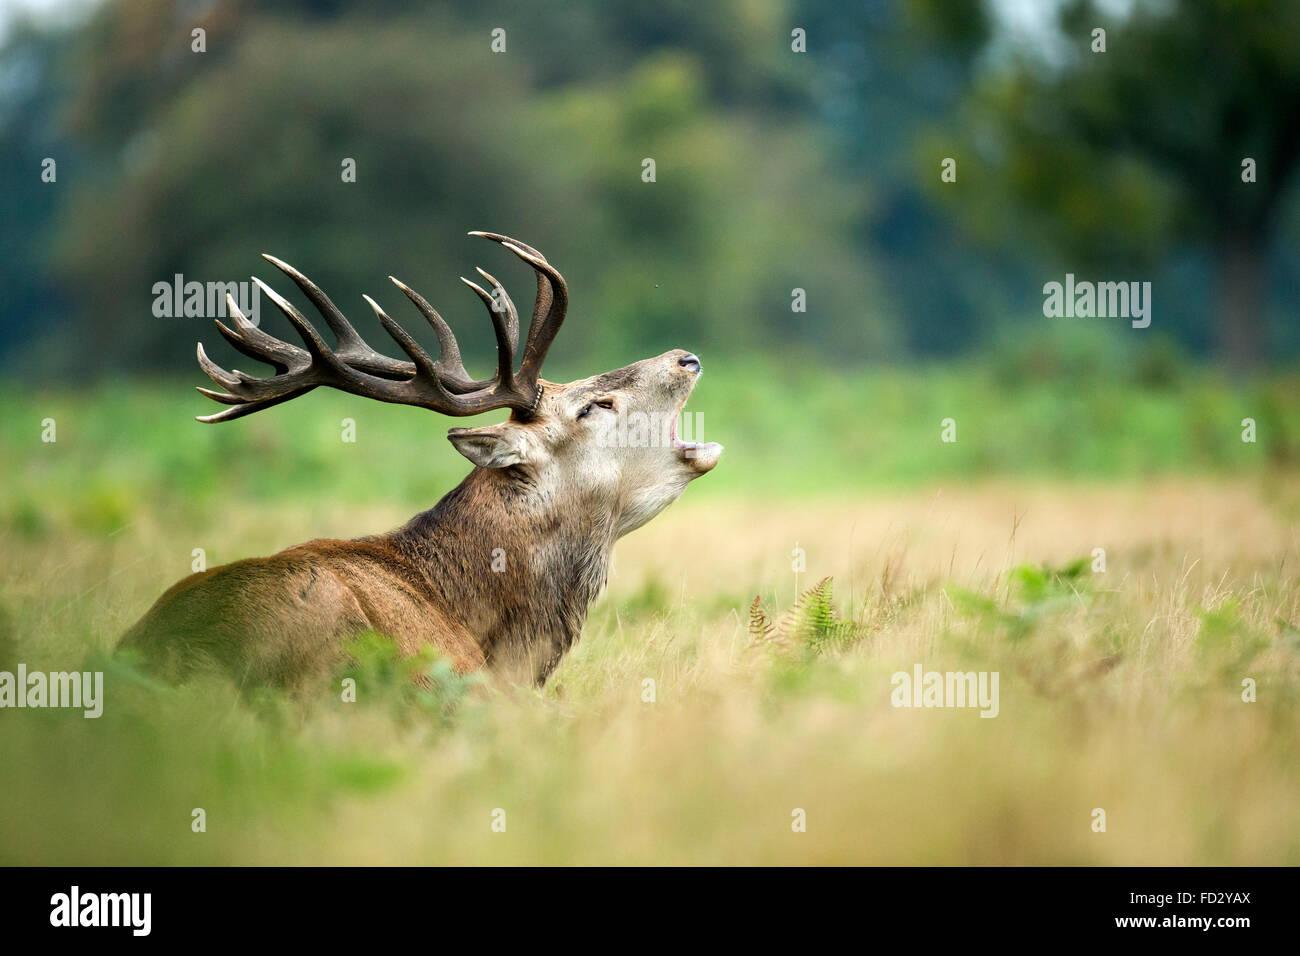 Red deer (Cervus elaphus) stag roaring during rutting season - Stock Image